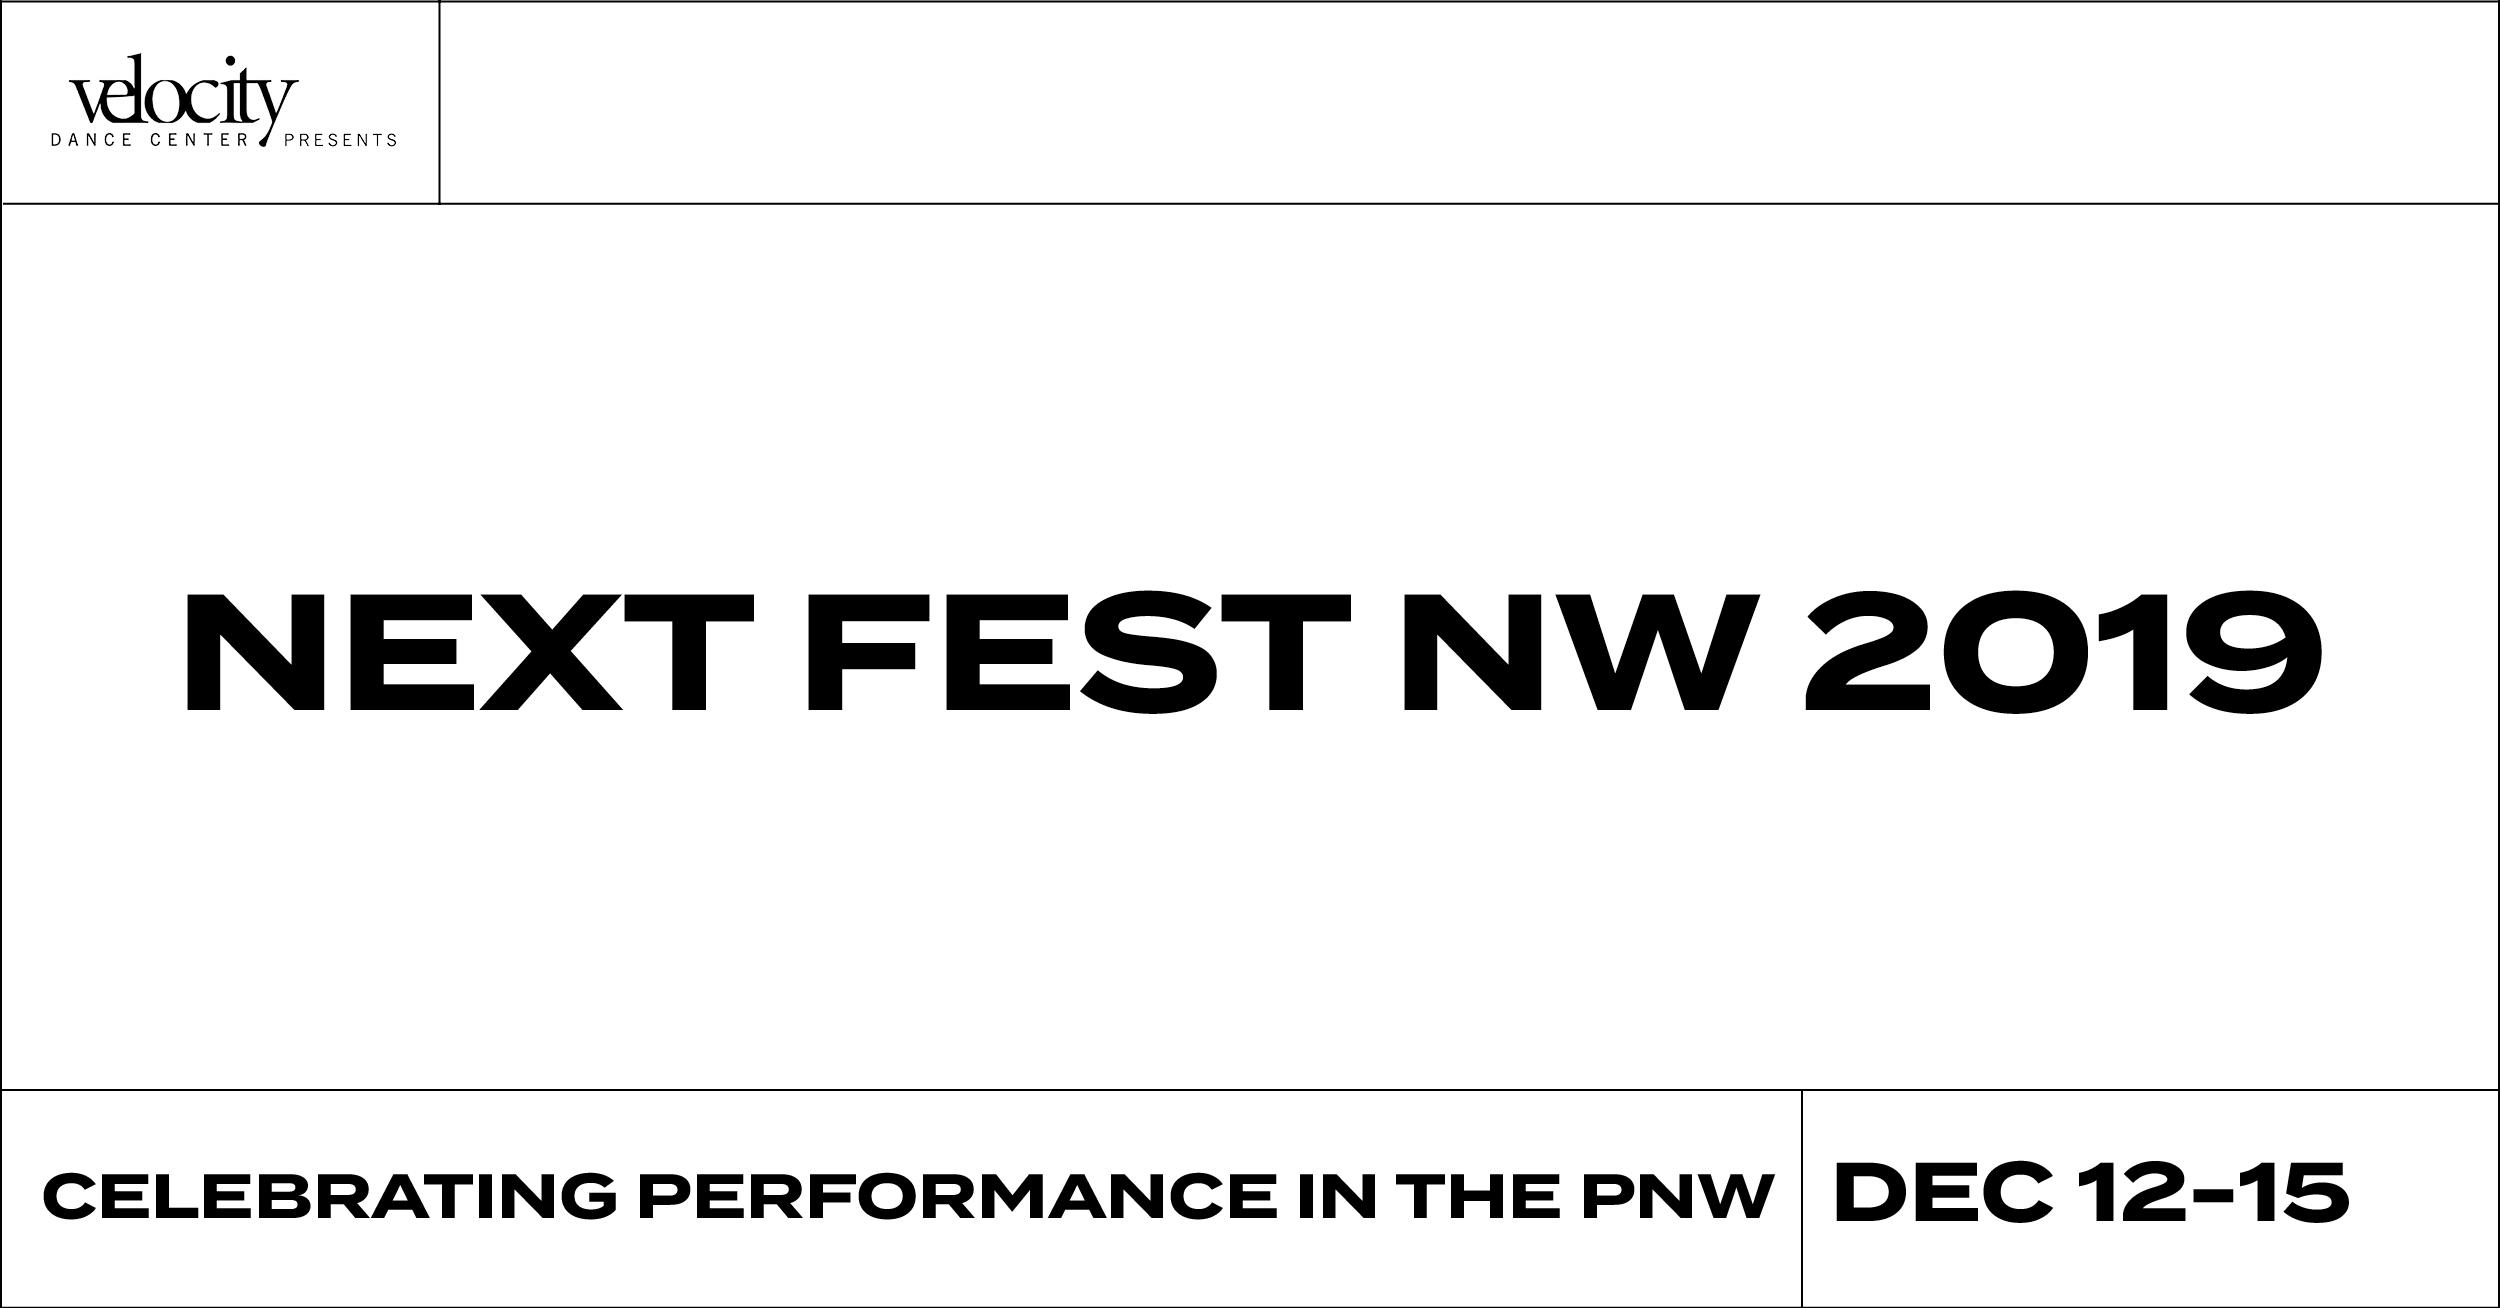 WebFB_NextFestNW_2019